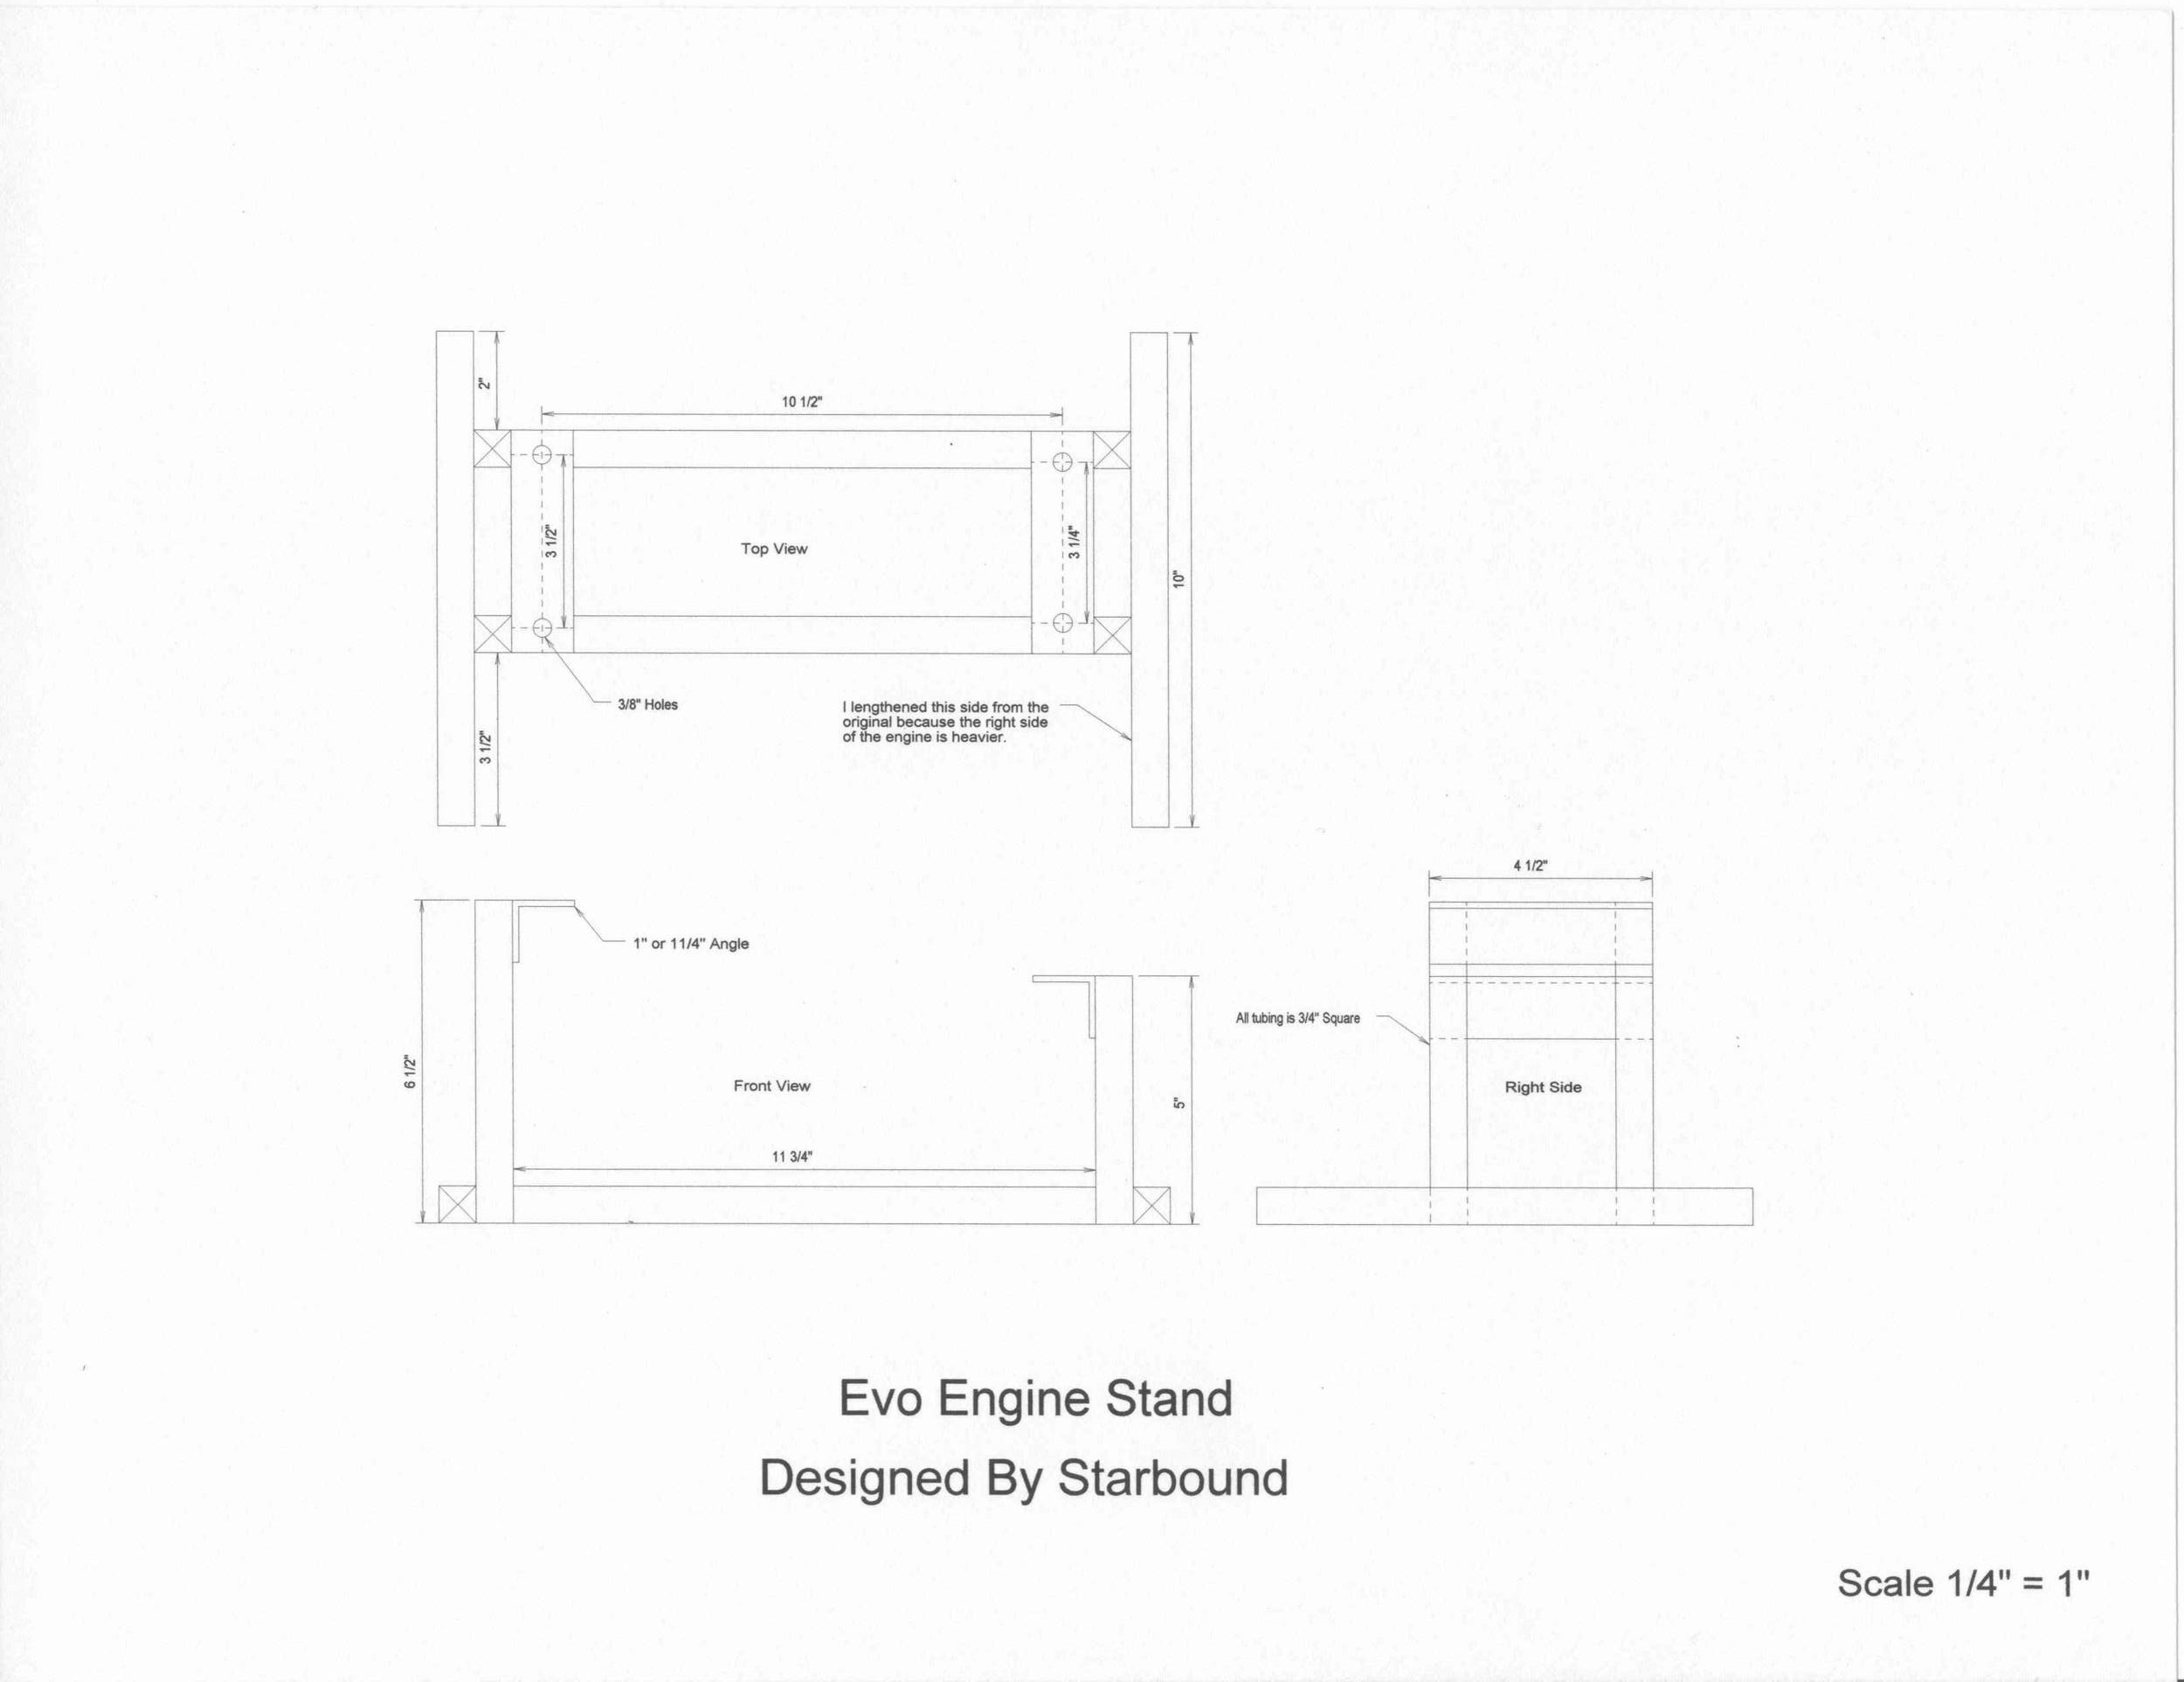 Shovelhead Engine Diagram Plans for A Harley Motor Stand – Mustaribrand Of Shovelhead Engine Diagram